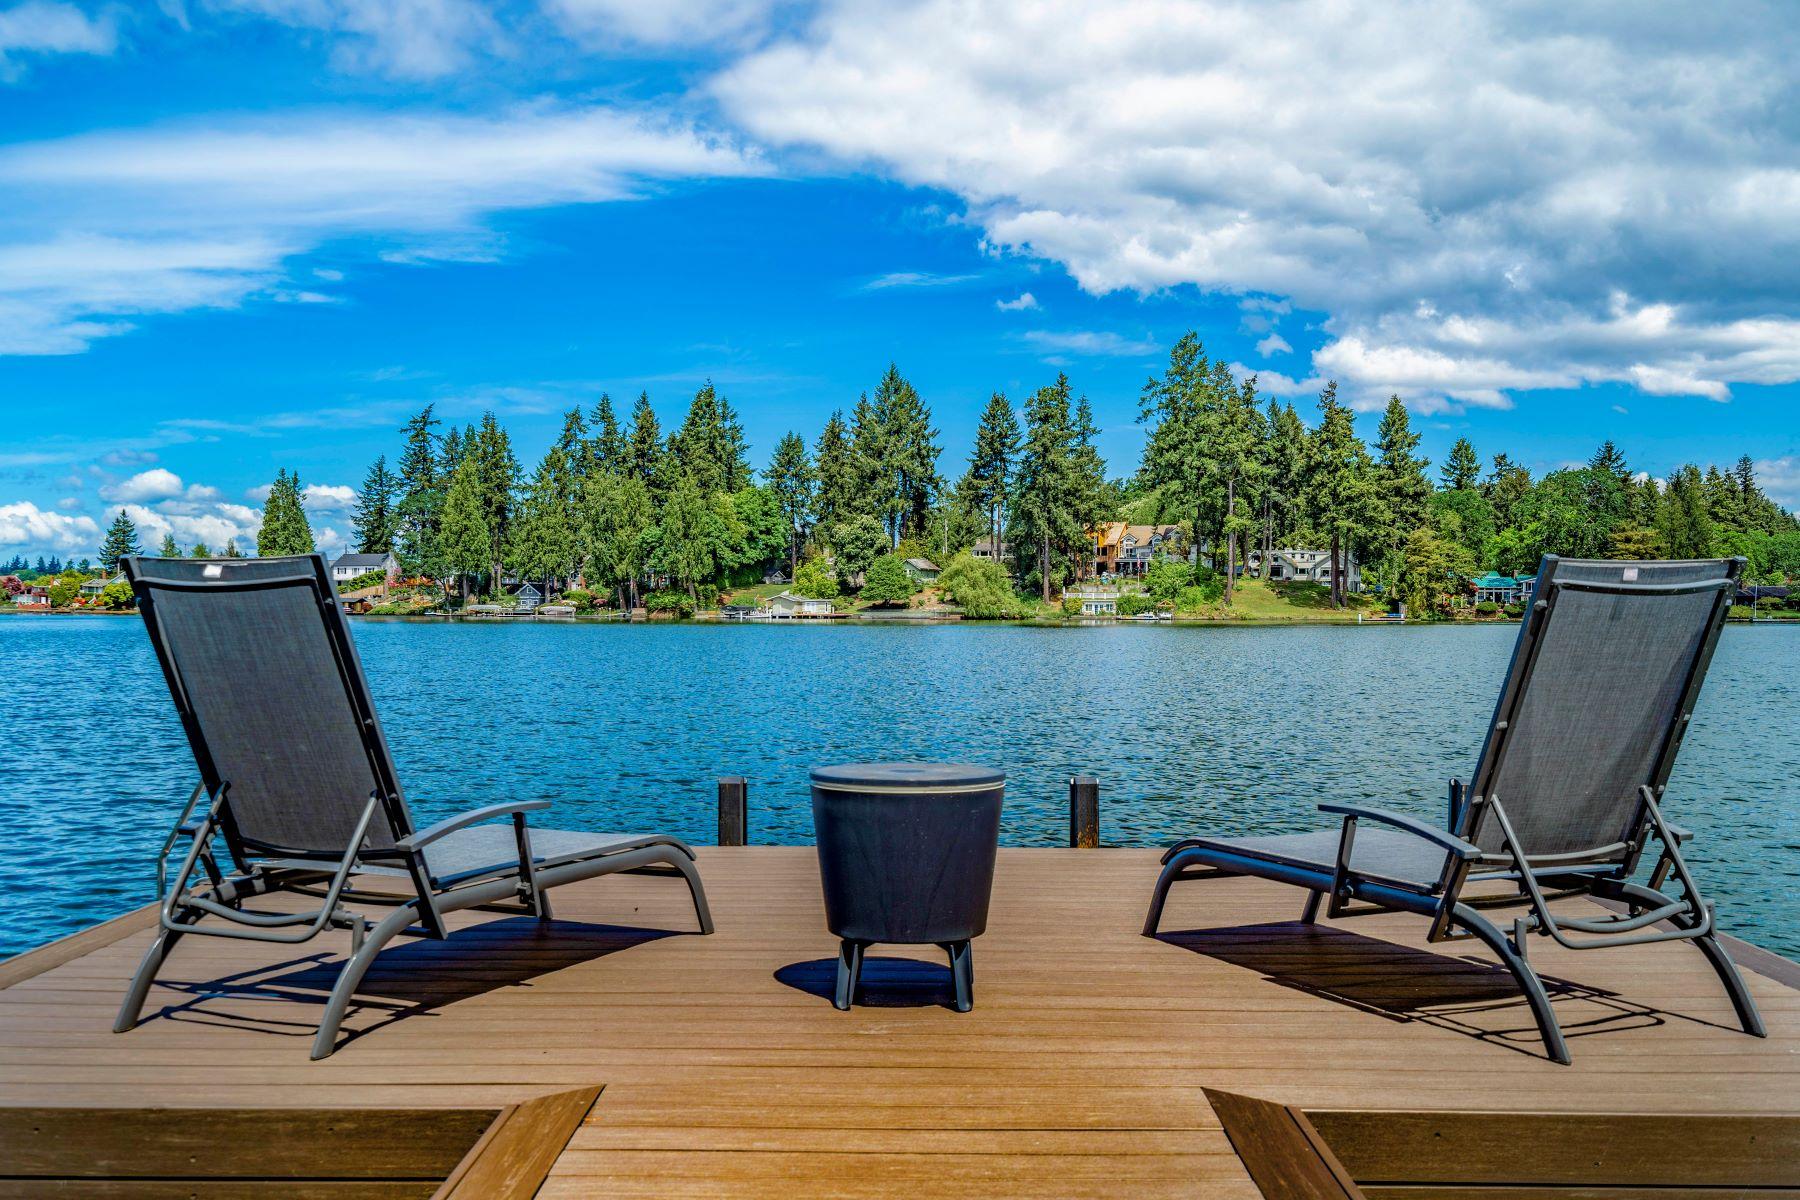 Single Family Homes for Sale at Unique Lake Steilacoom Waterfront 15 Lagoon Lane SW, Lakewood, Washington 98498 United States